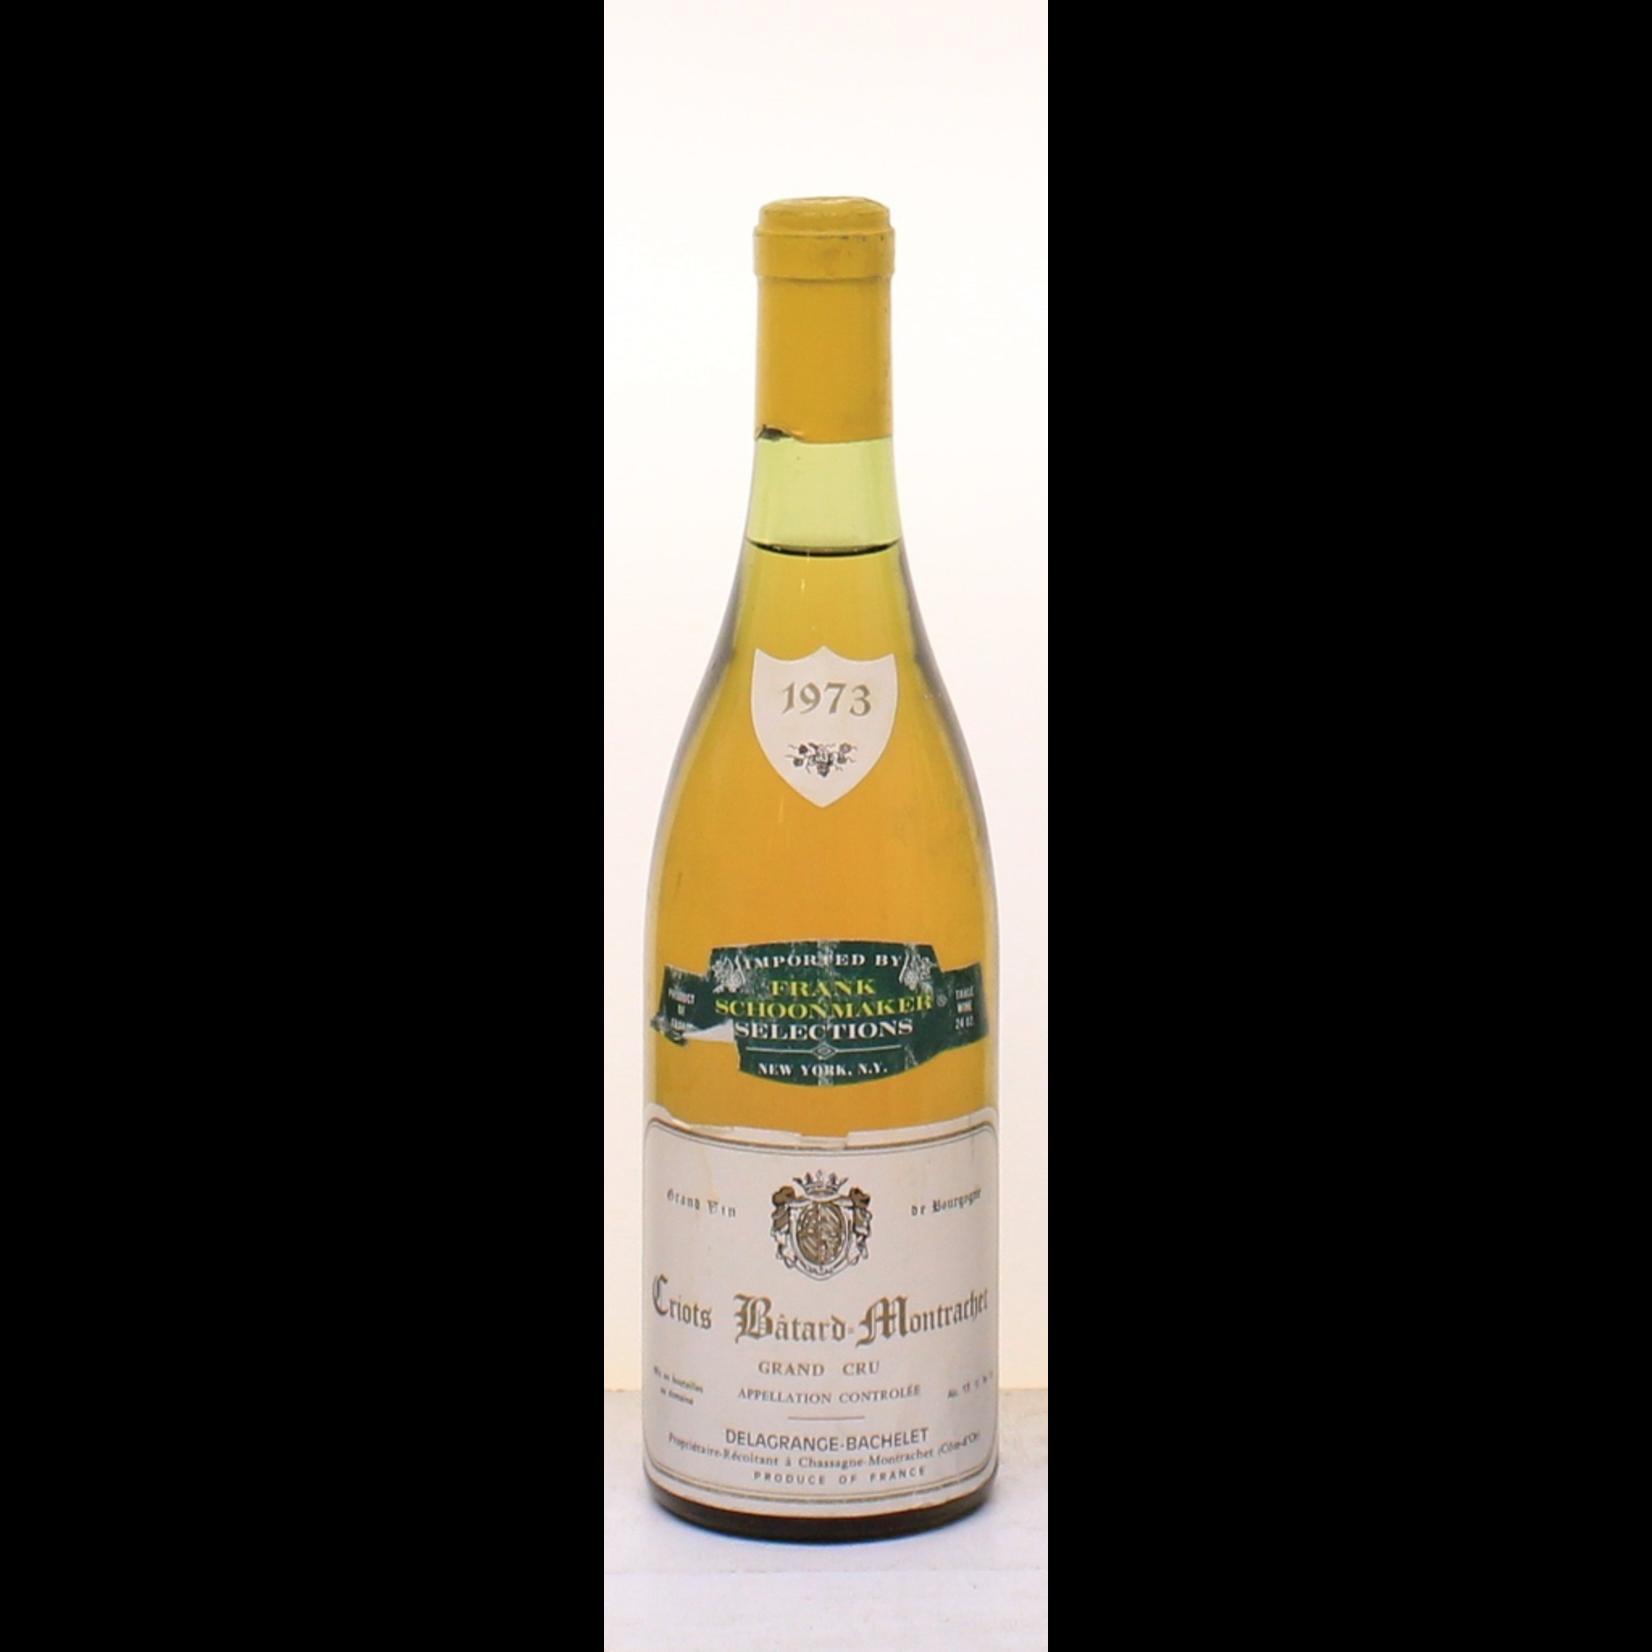 Wine Domaine Delagrange Bachelet Criots Batard Montrachet Grand Cru 1973